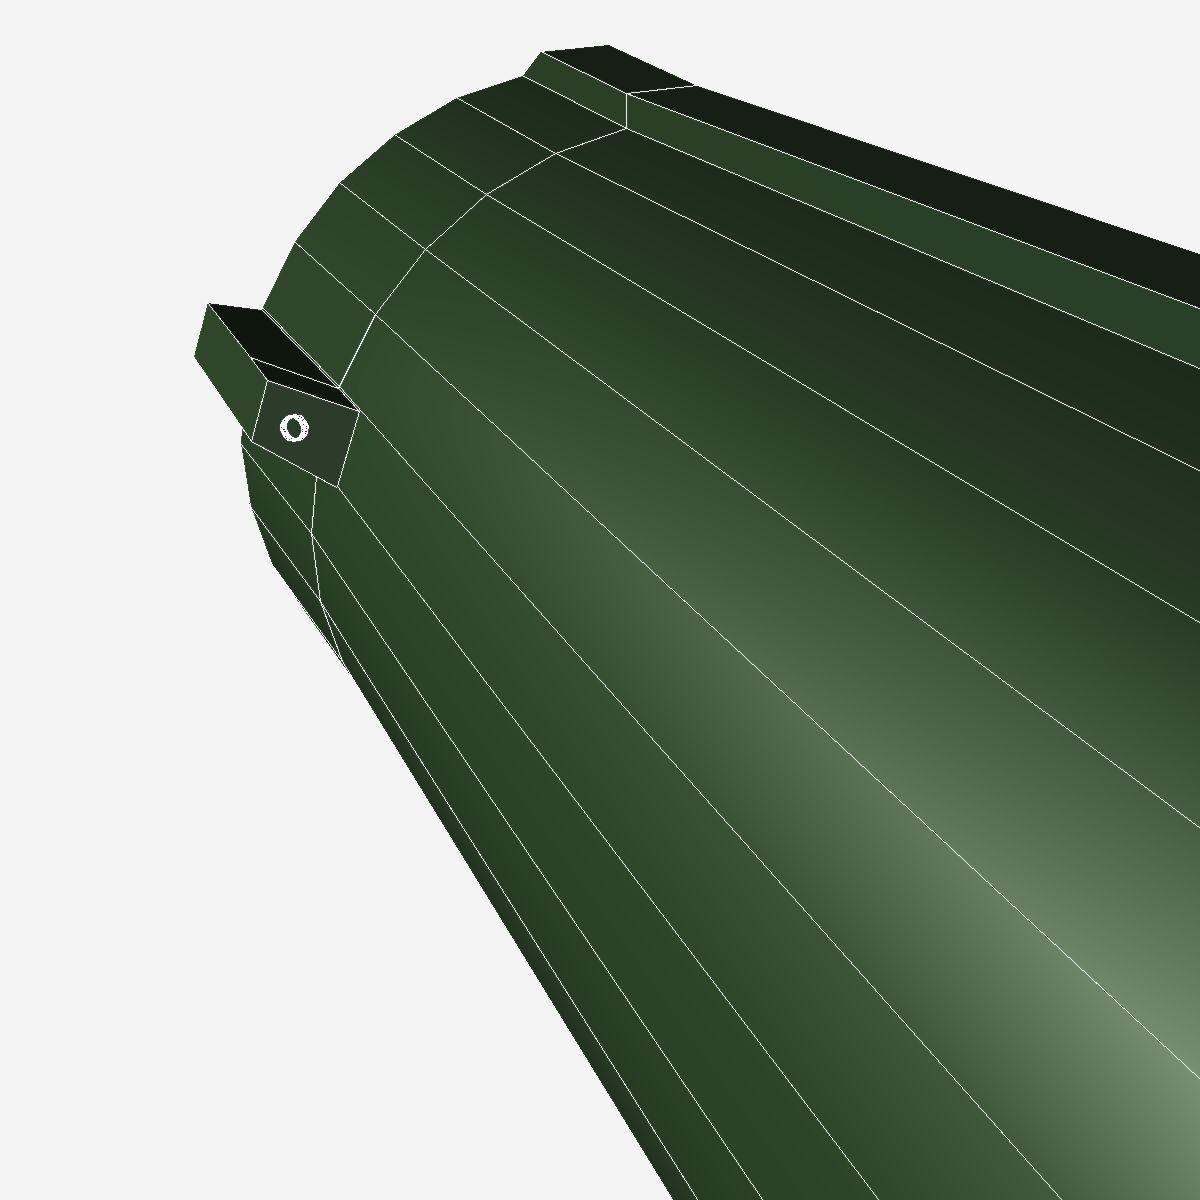 dprk kn-08 no dong-c пуужин 3d загвар 3ds dxf cob x obj 151635